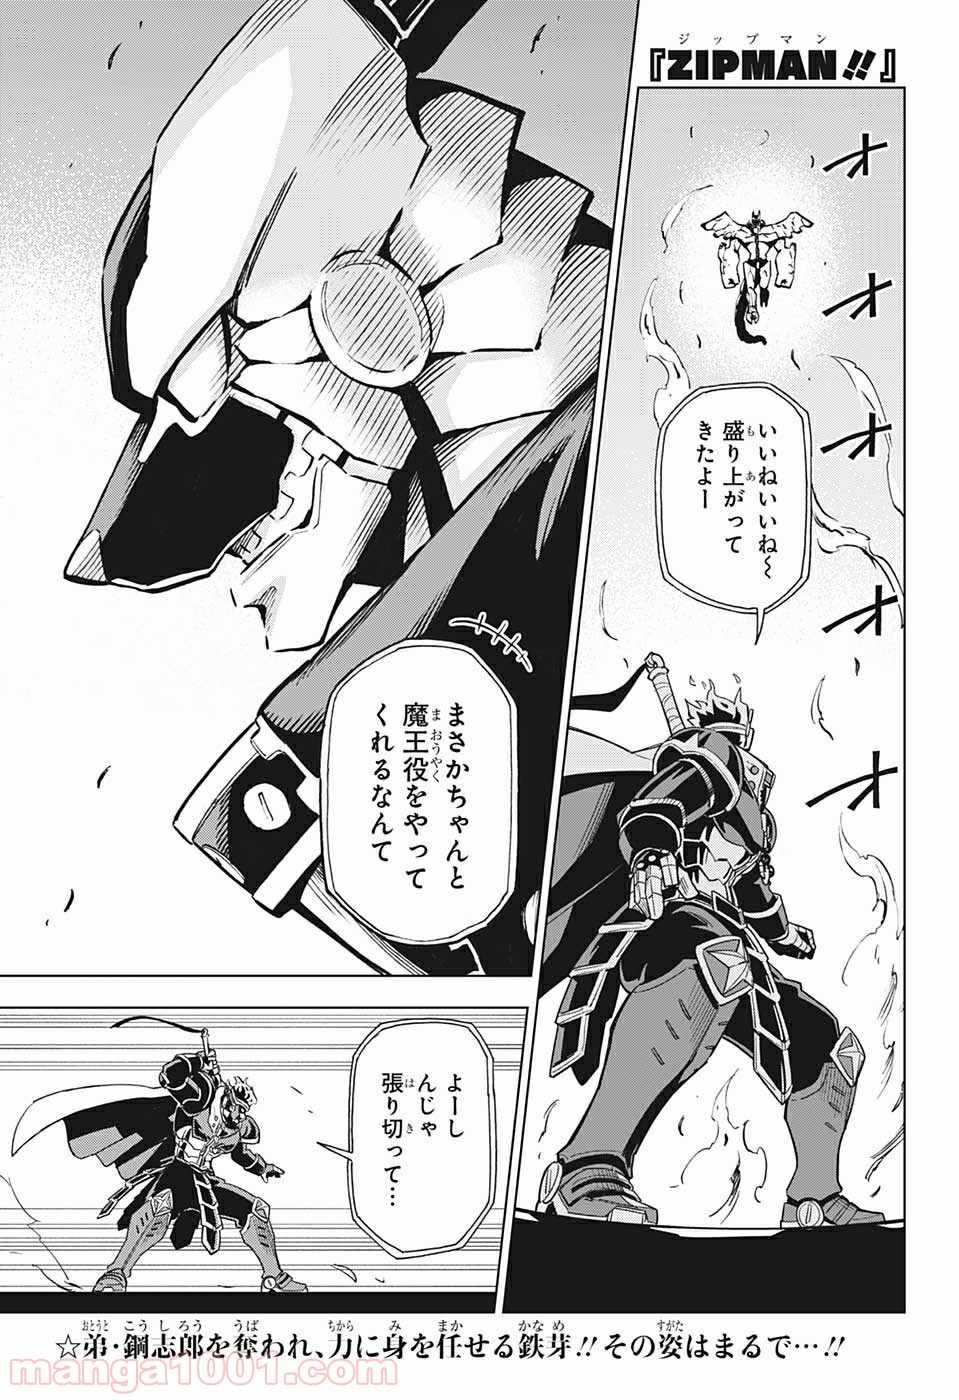 ZIPMAN!! - Raw 【第10話】 - Manga1001.com